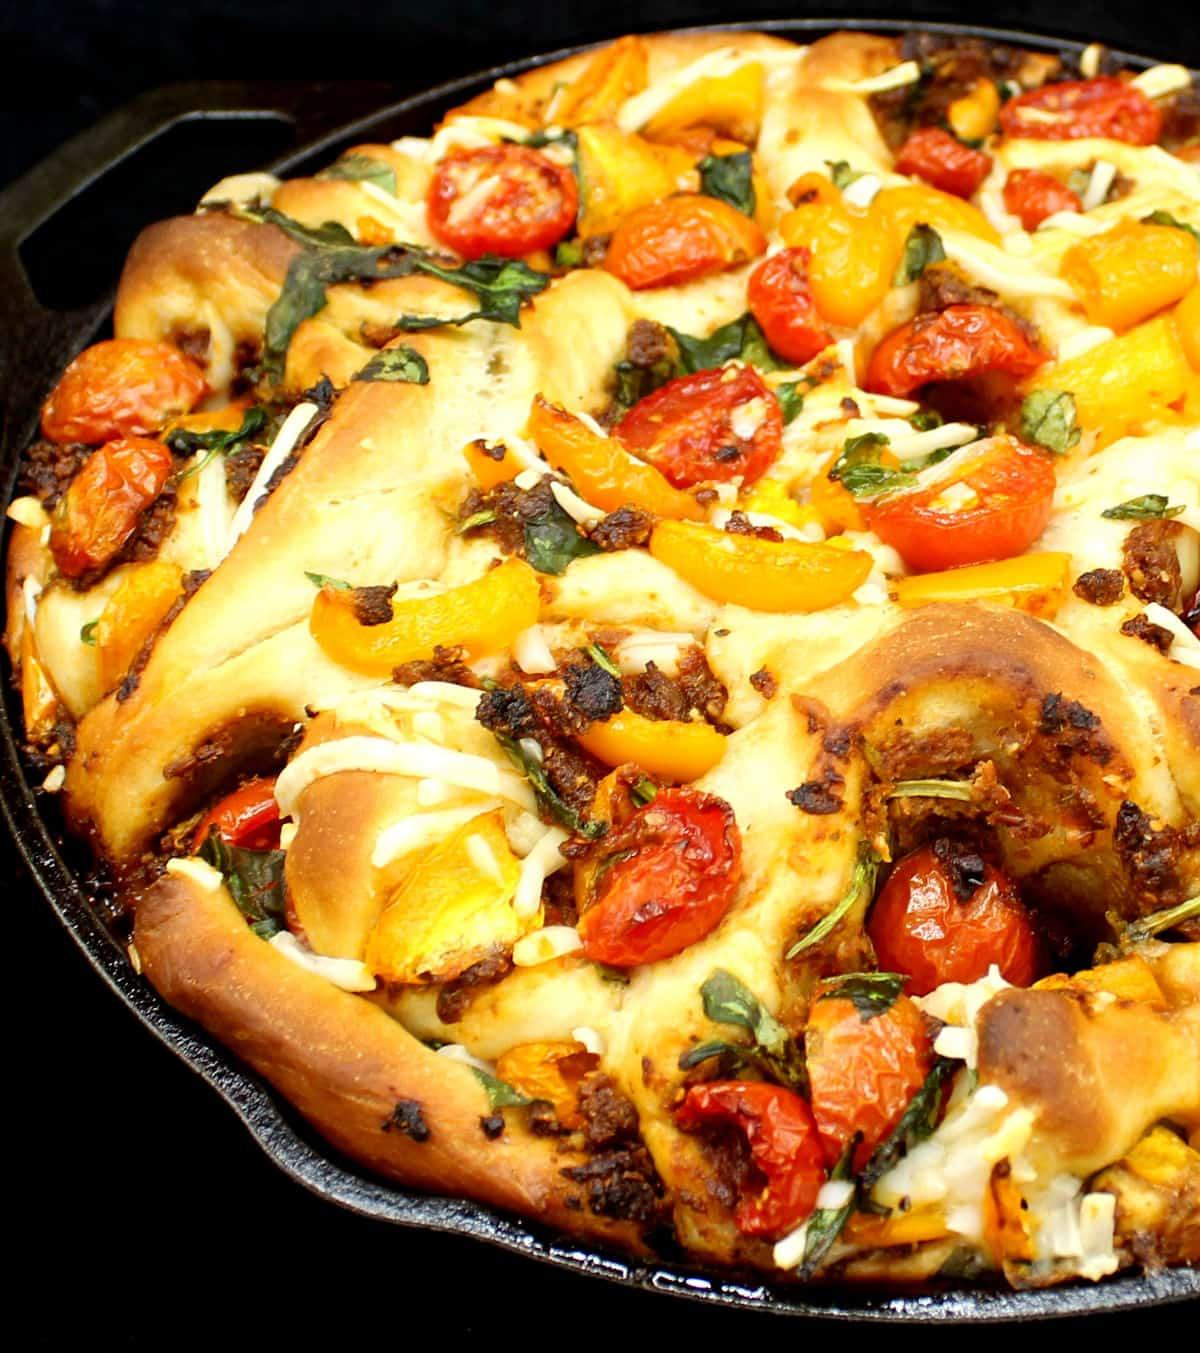 Vegan Pizza Rolls in skillet with lots of veggies